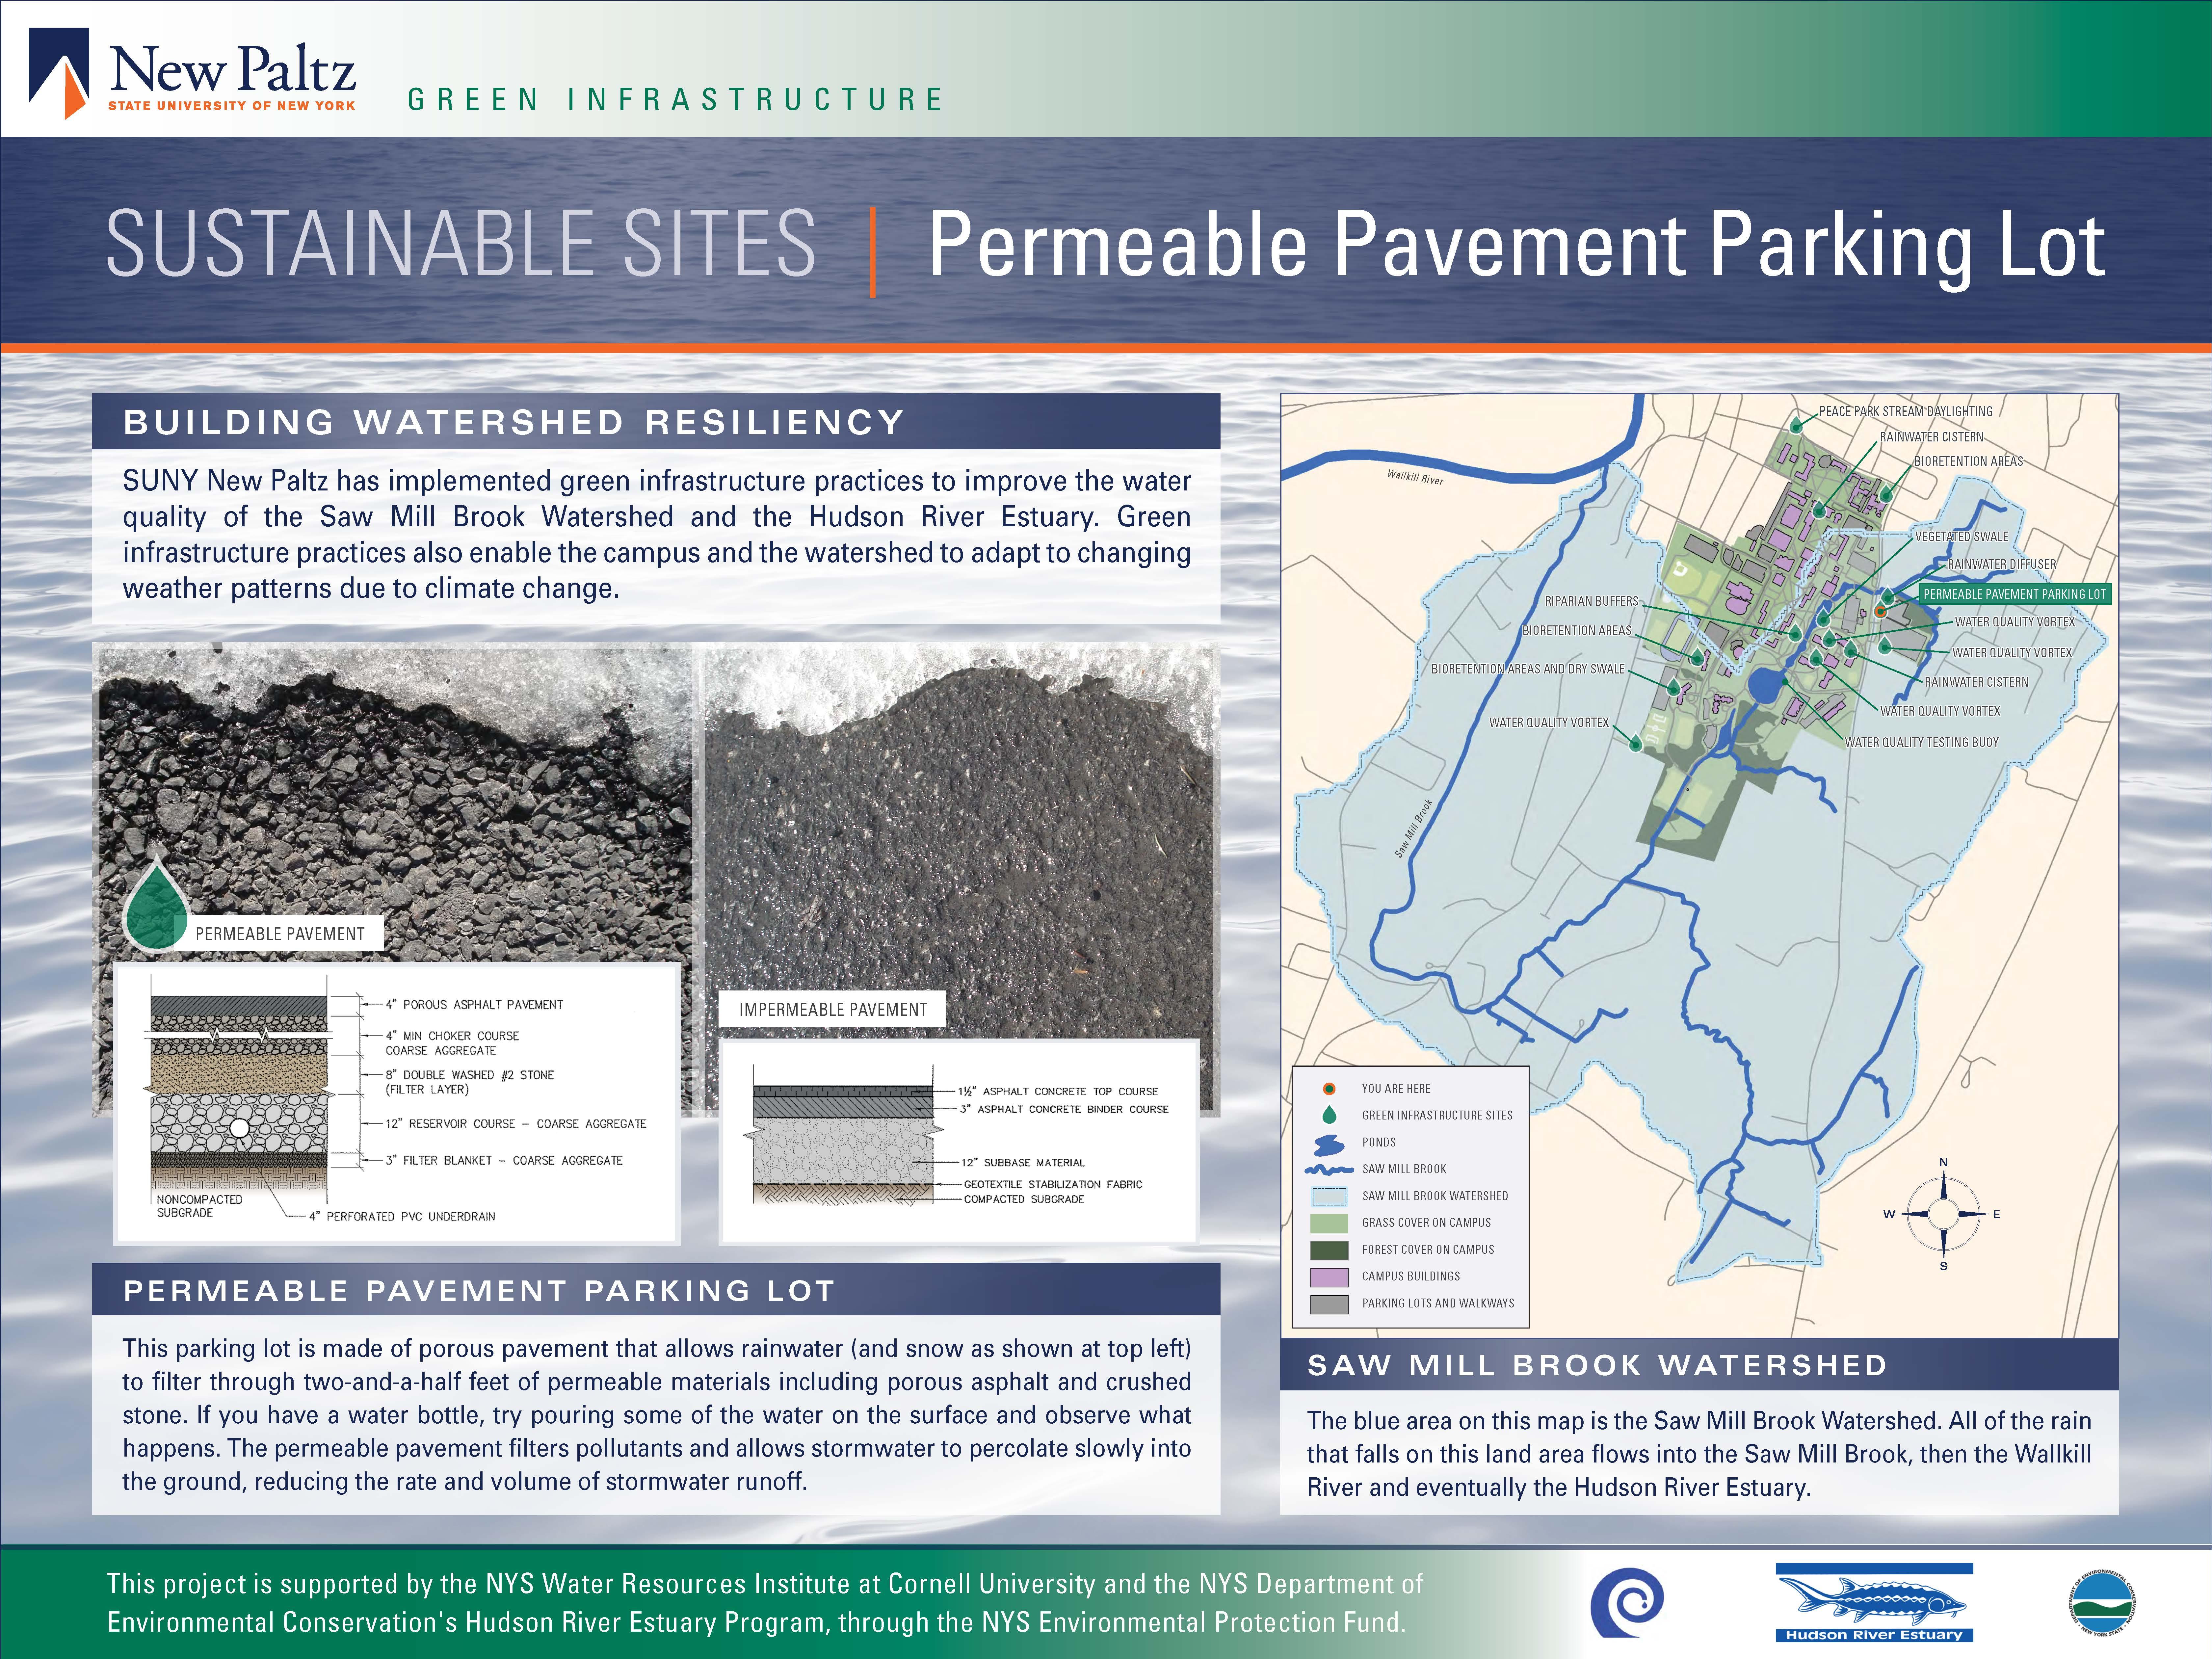 SUNYNP-PermeablePavement